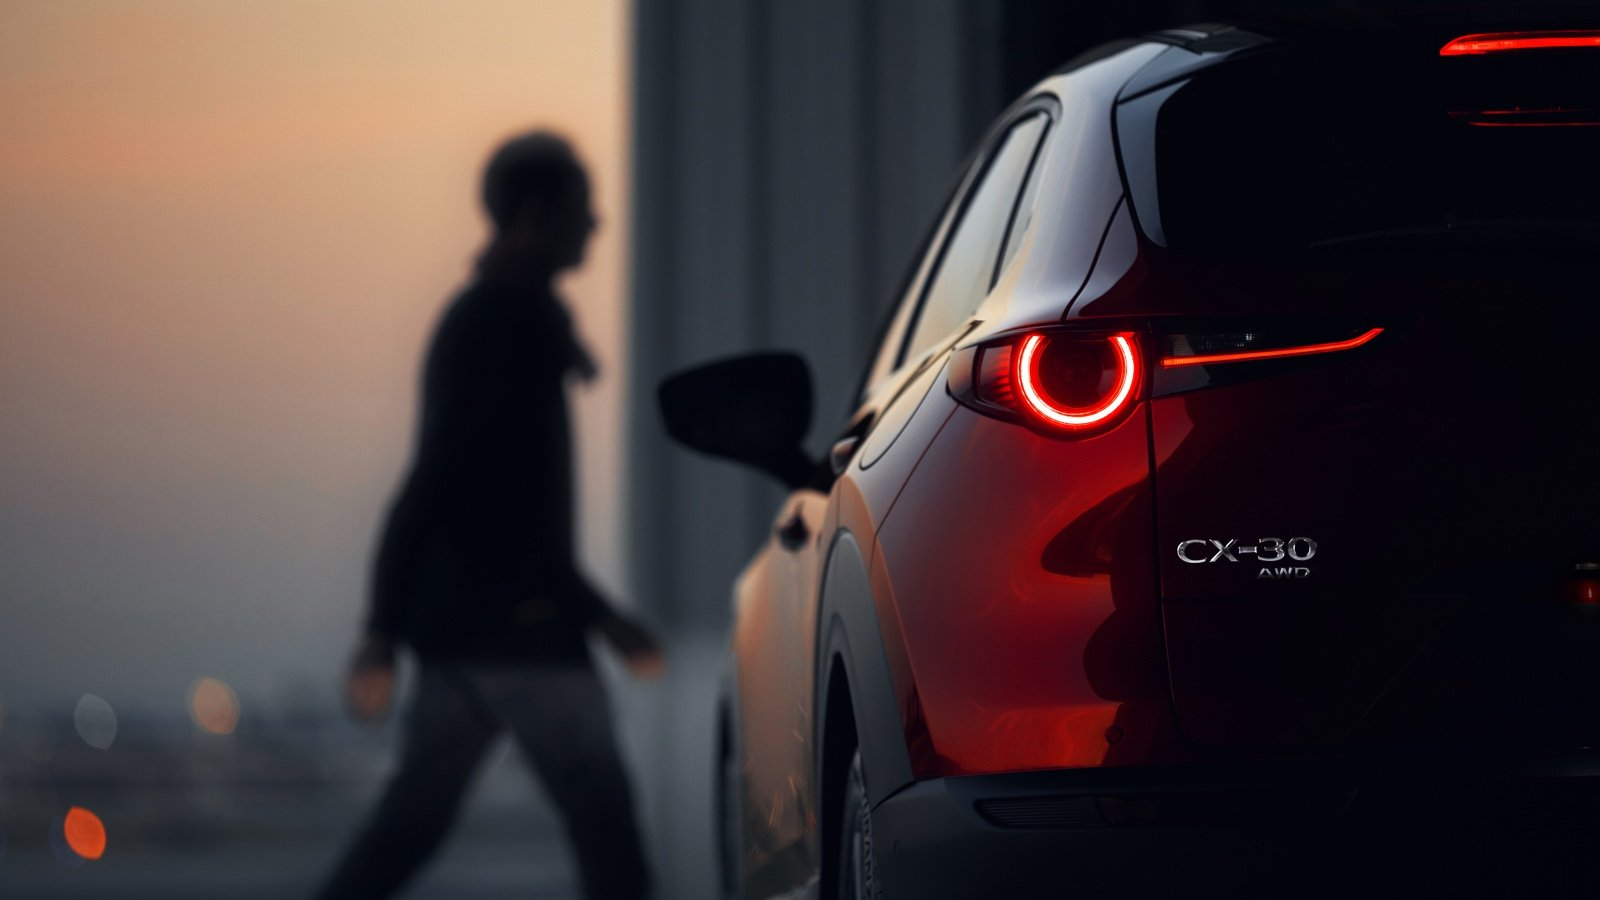 CX-30 Human-centric technology